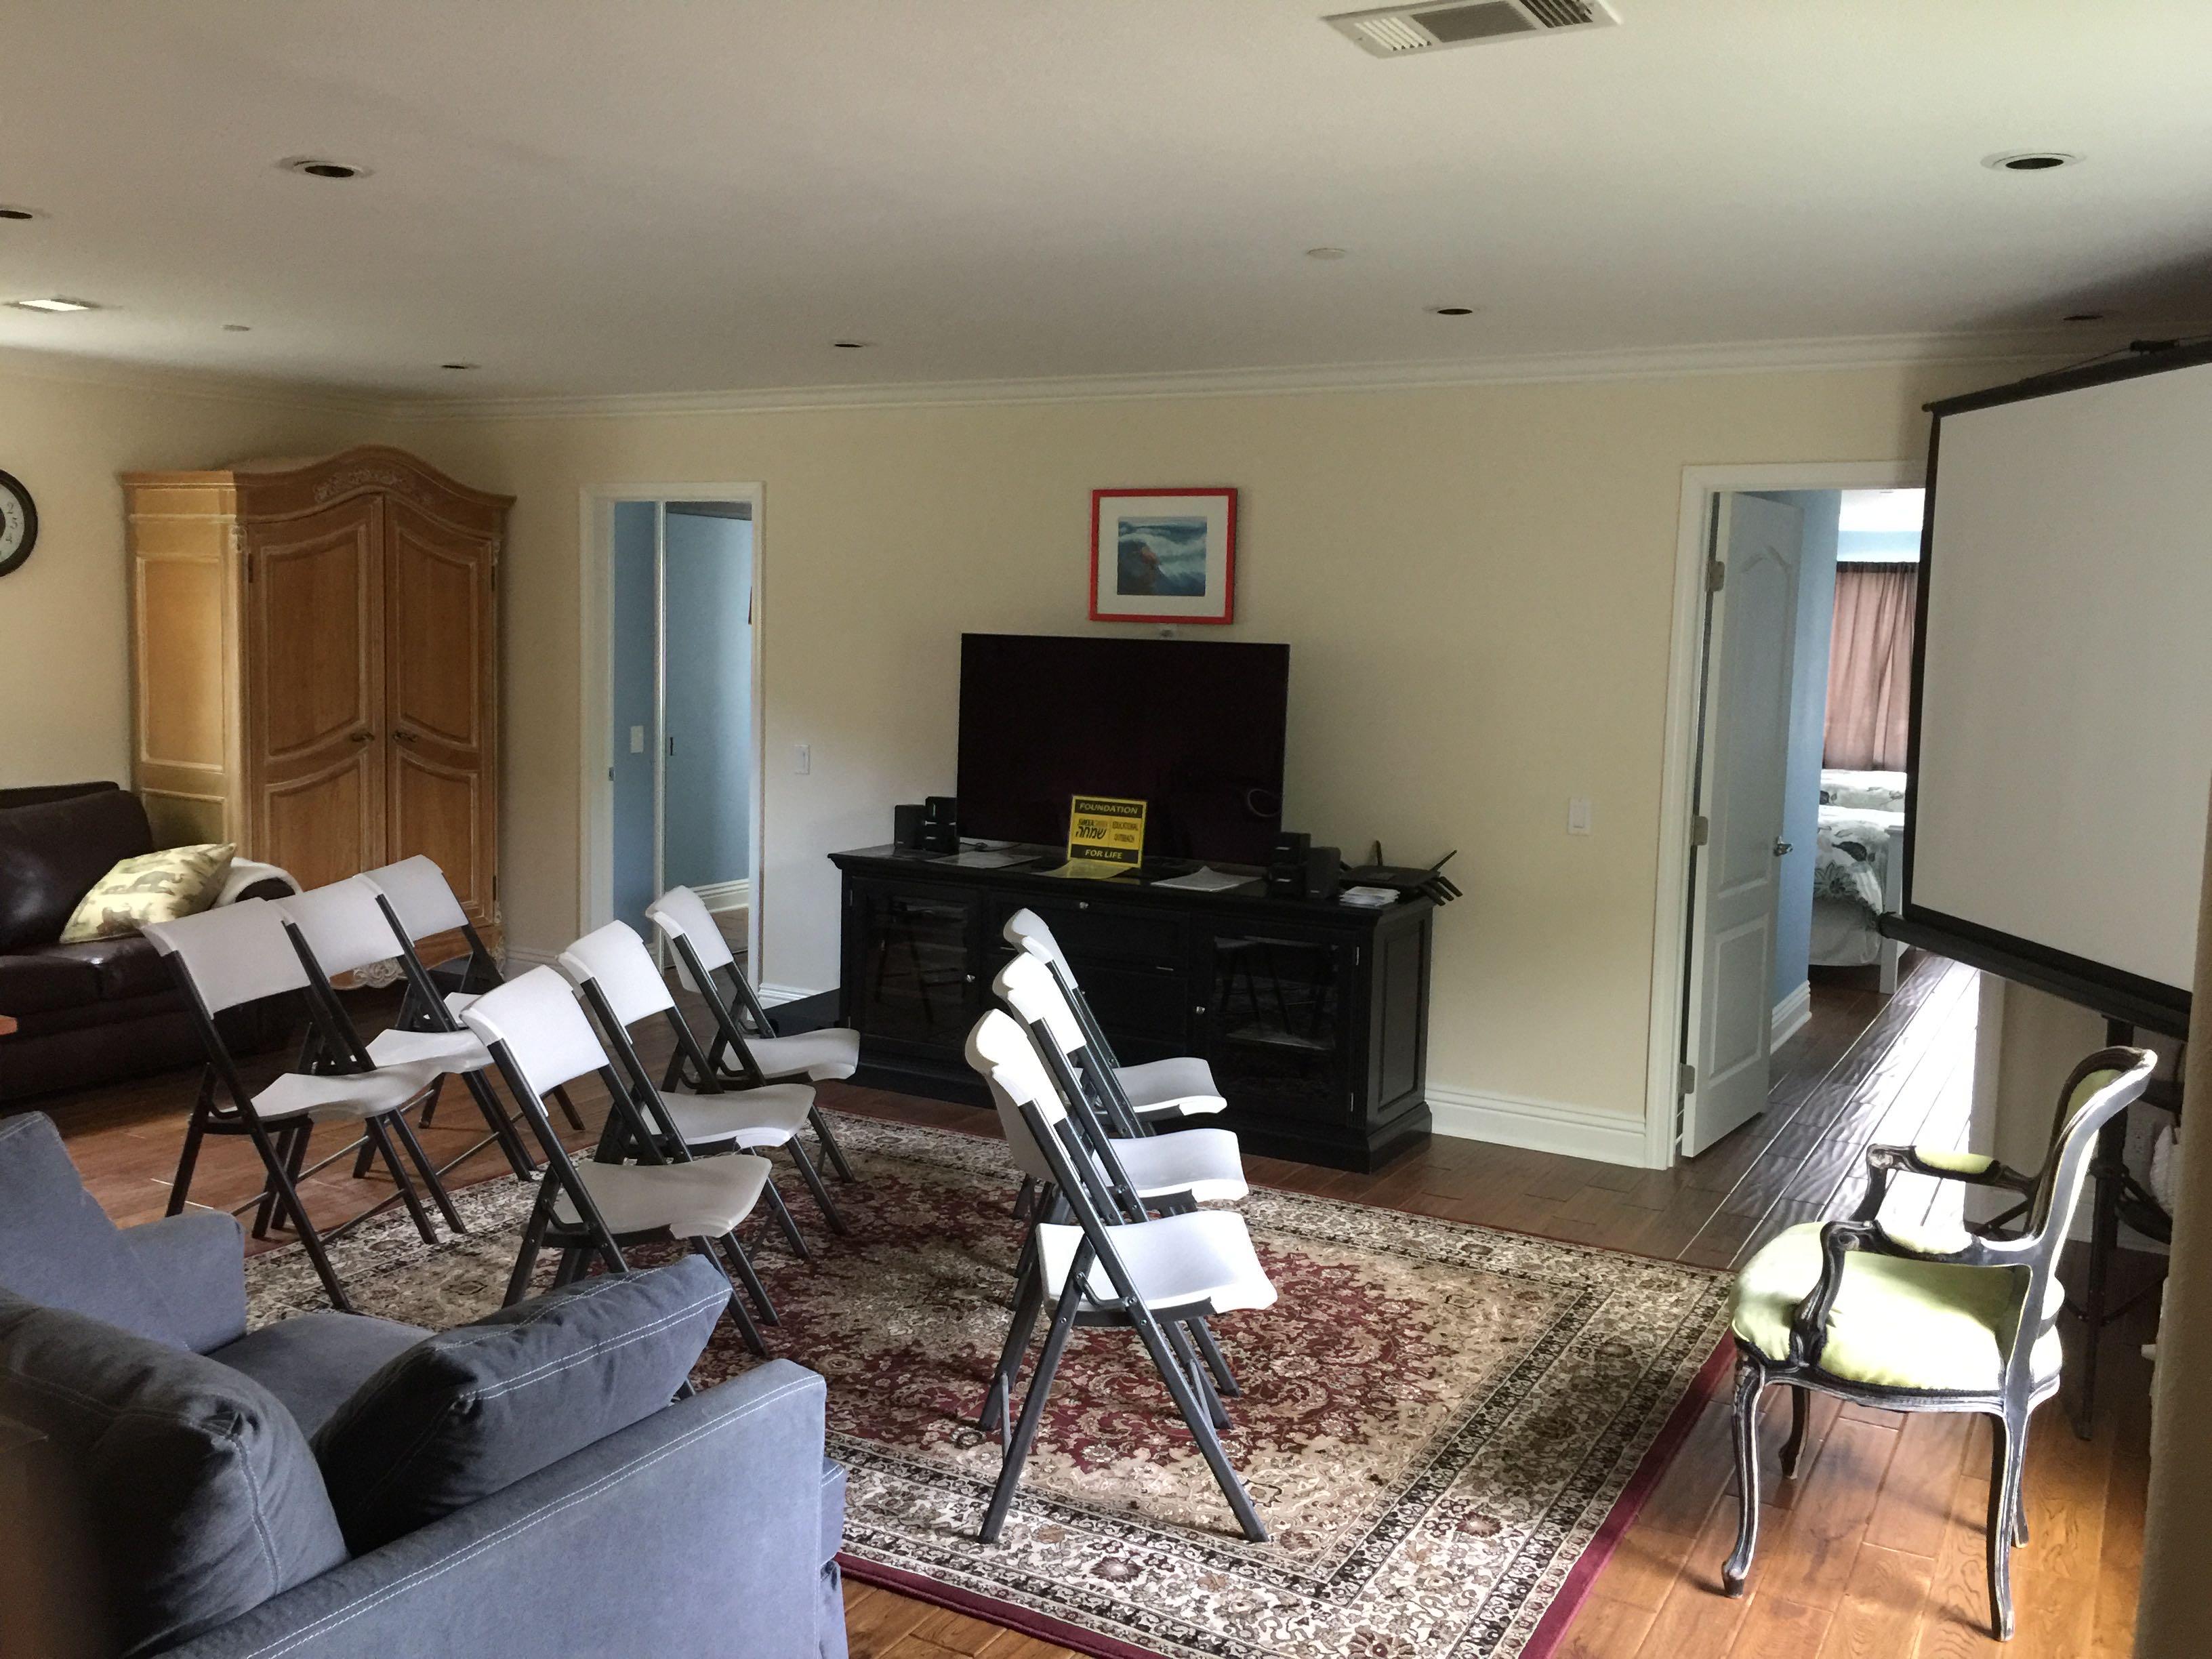 Lecture area